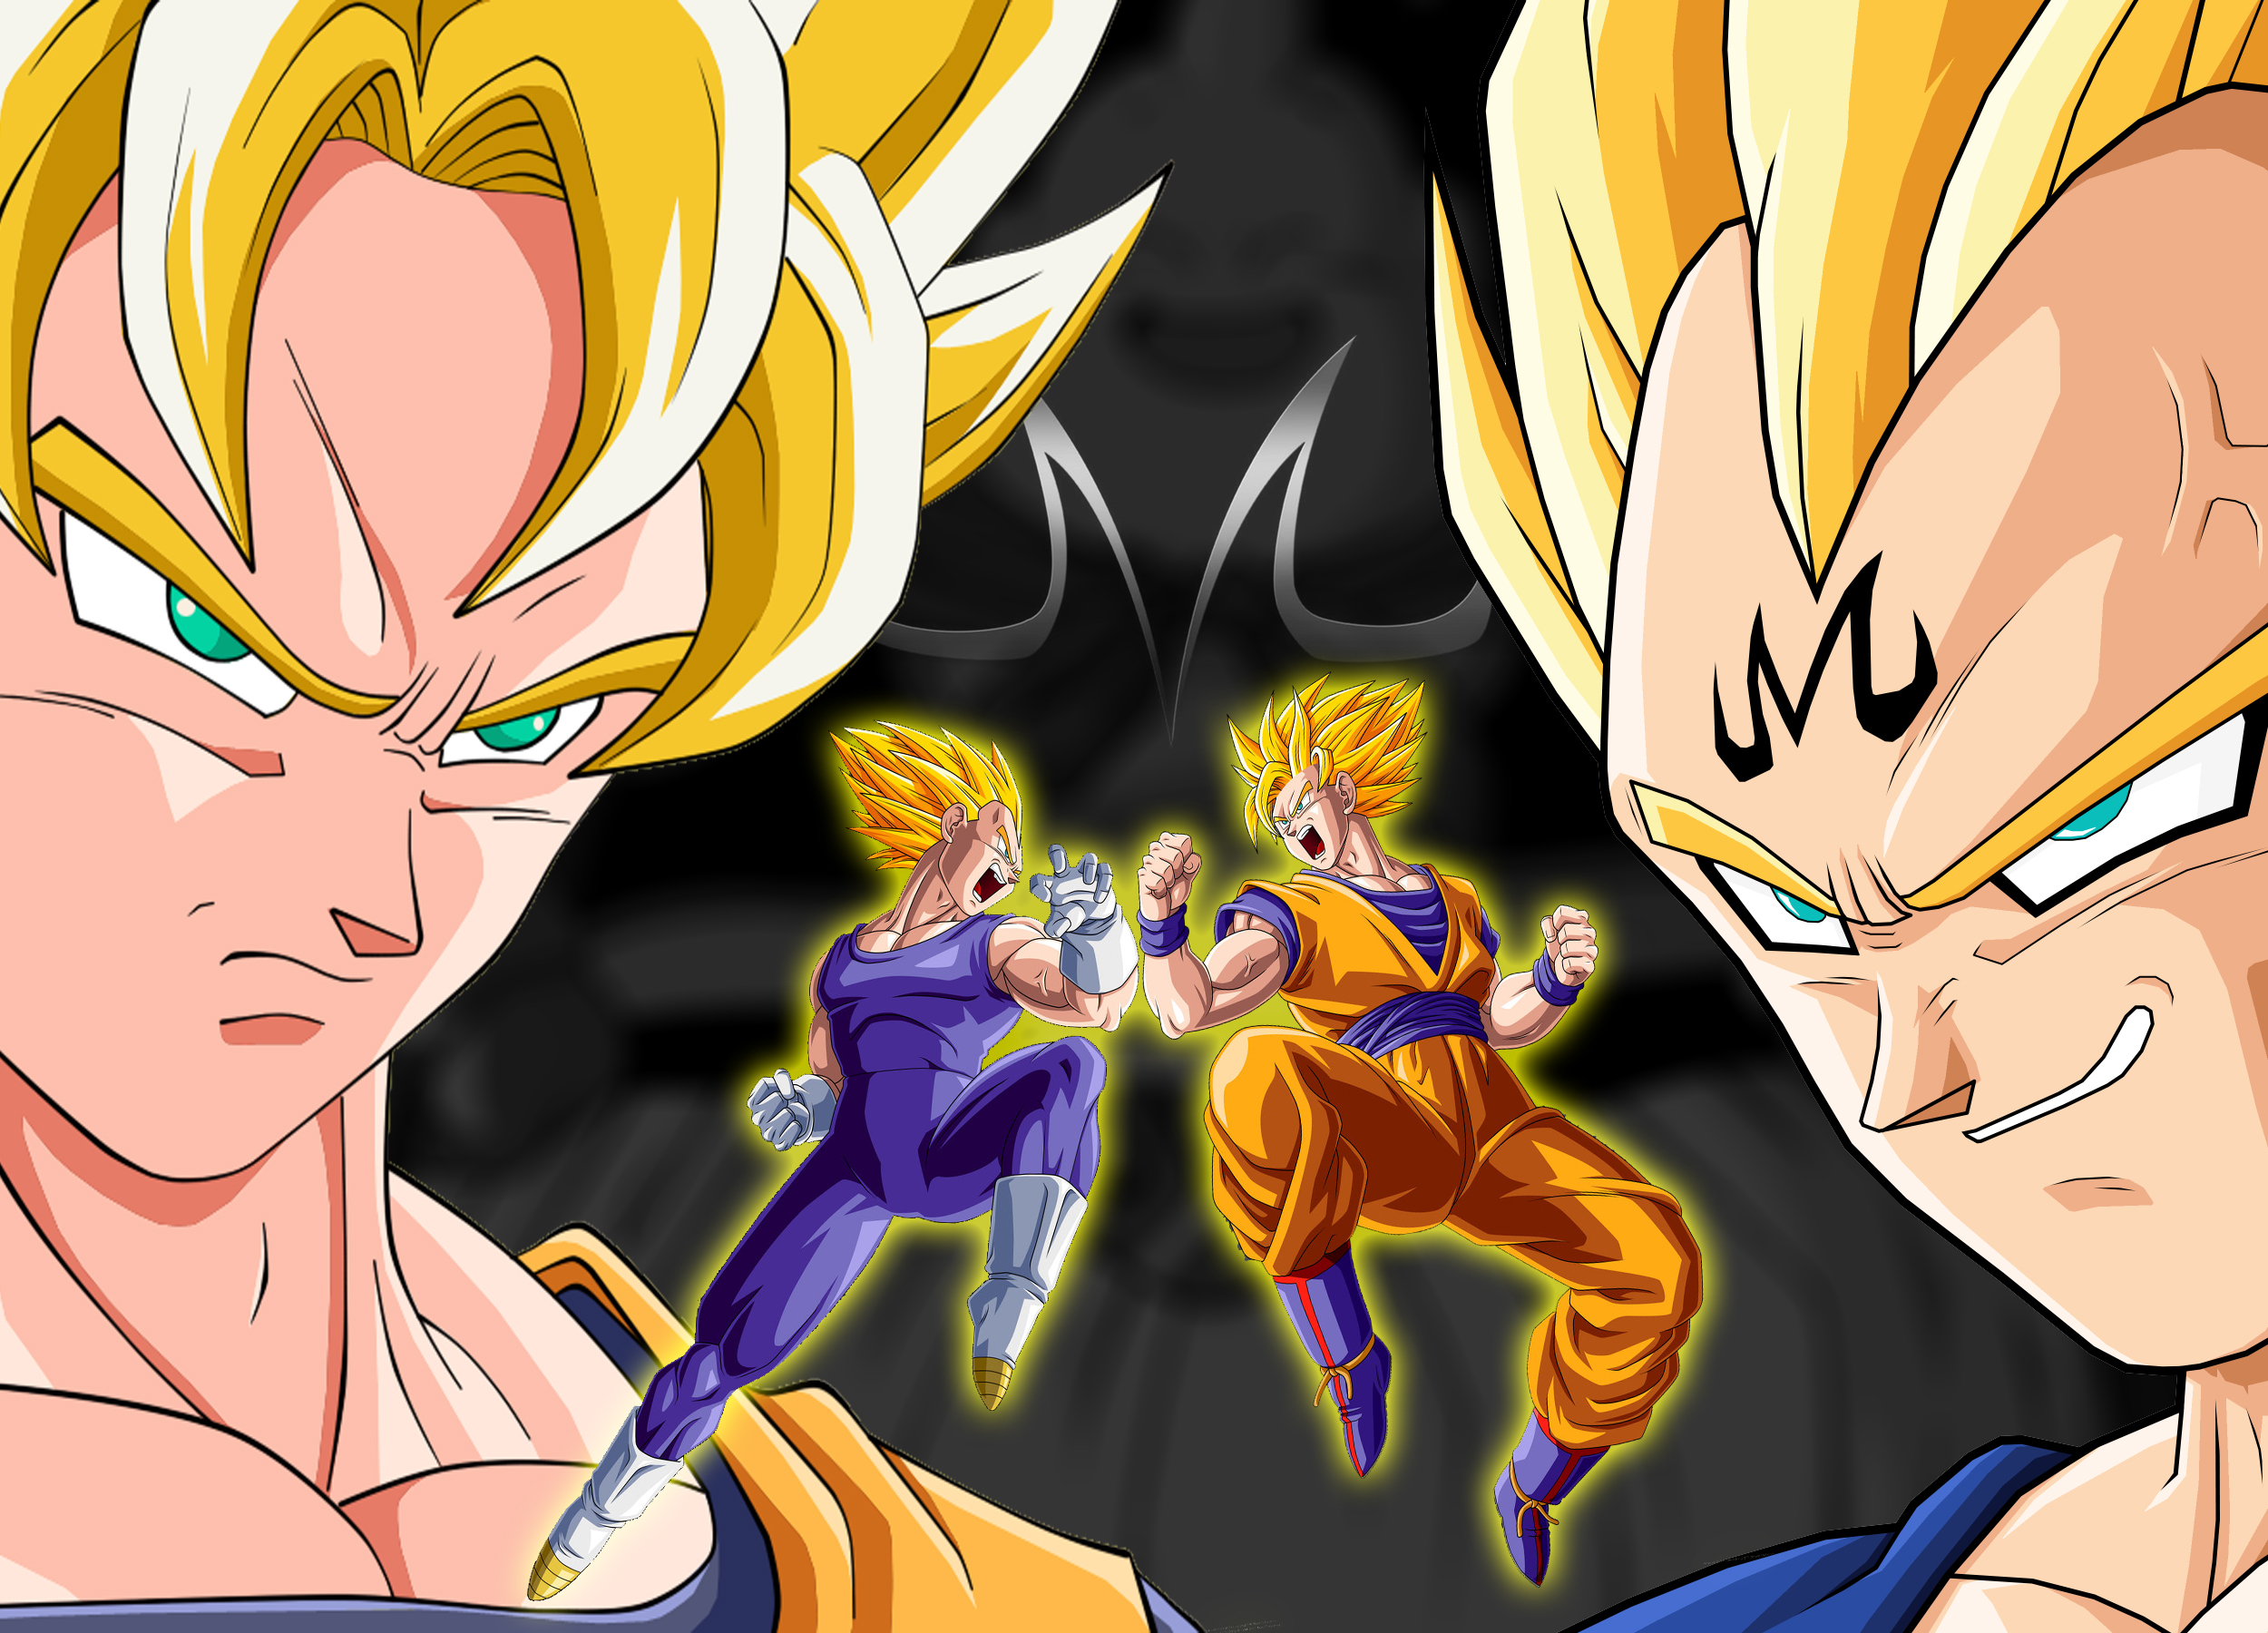 Goku Vs Vegeta Wallpaper   ForWallpapercom 2500x1800